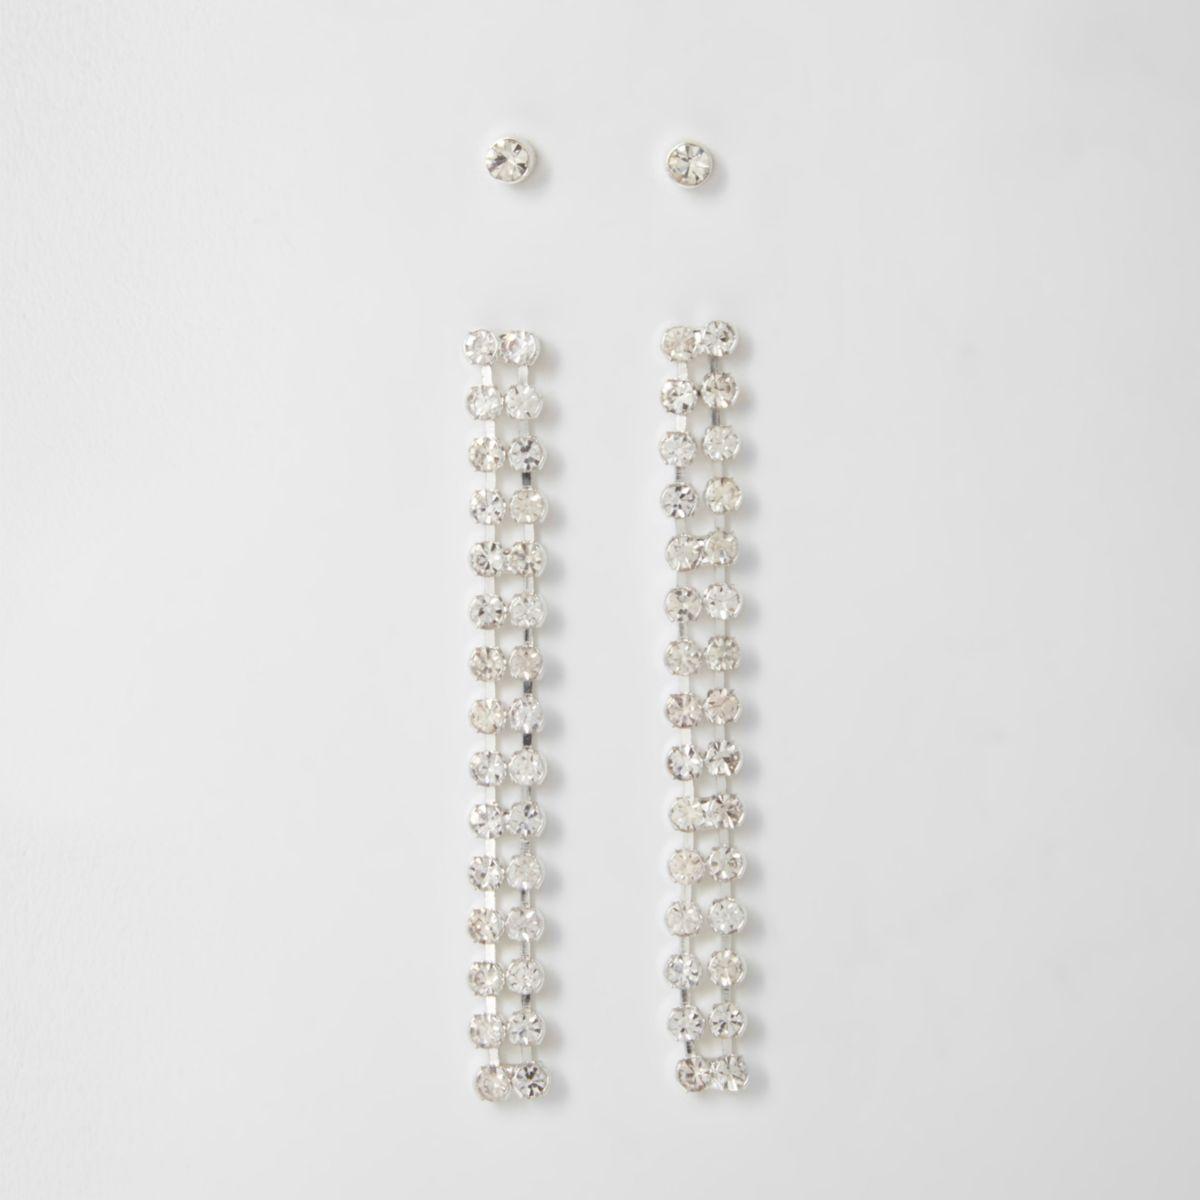 Diamante stud and dangle earrings set